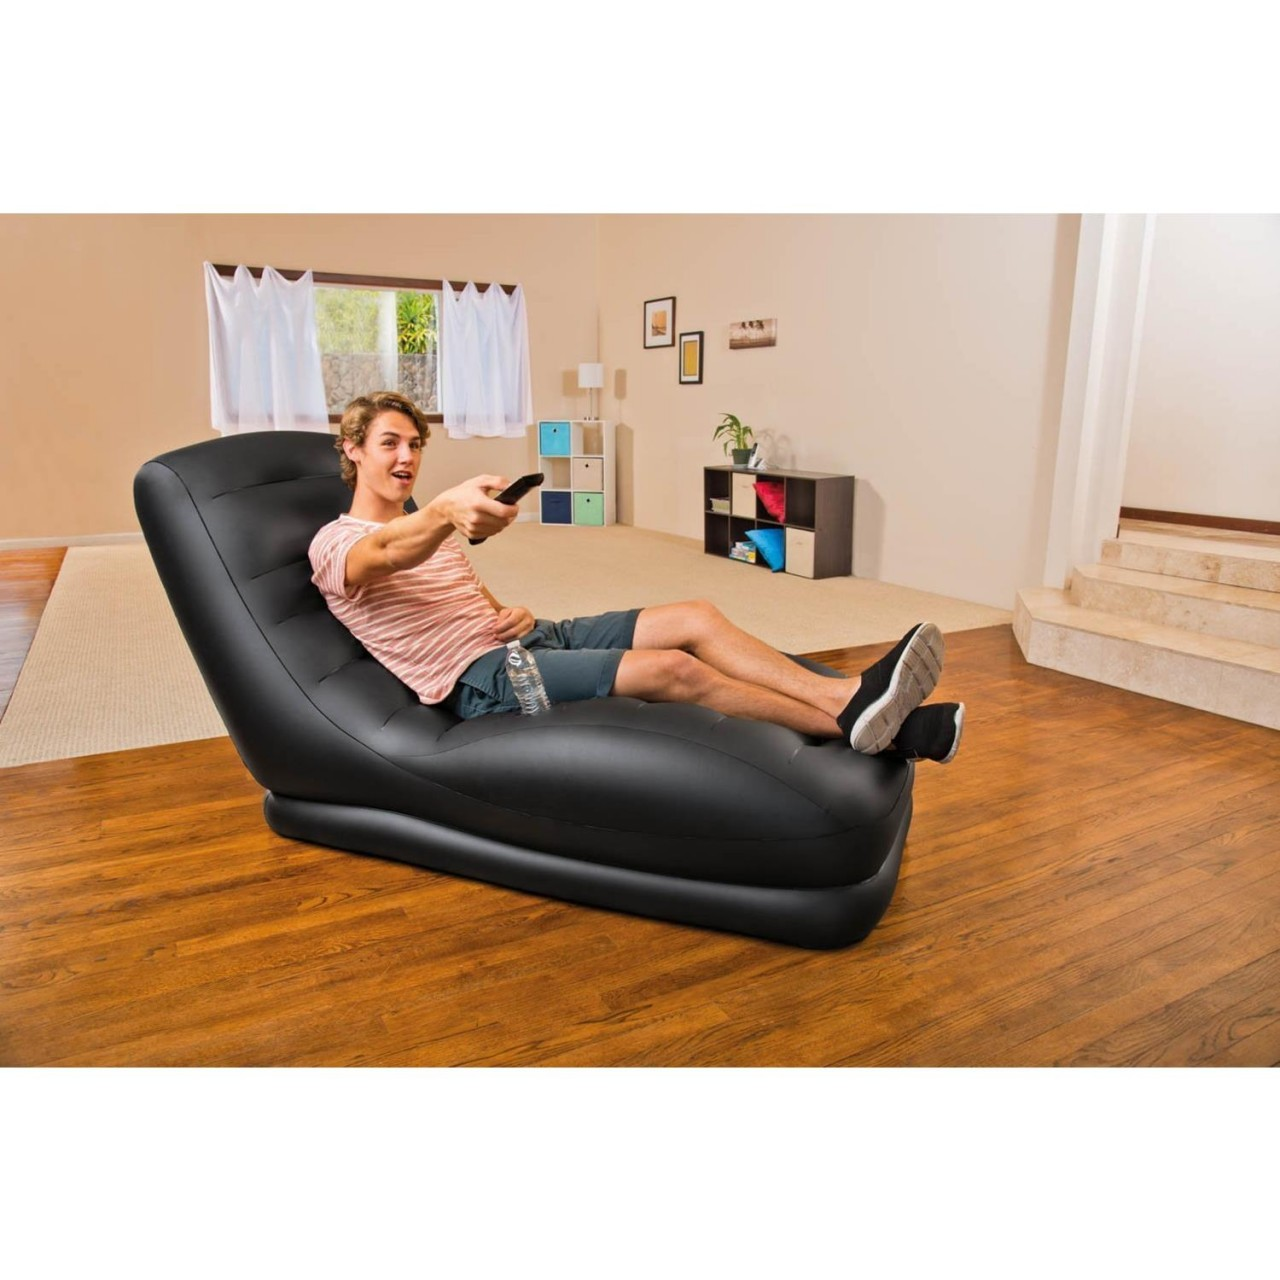 Intex 68585 Luftsessel Mega Lounge Liege Gamersessel Couch Sitz 173x81x91cm